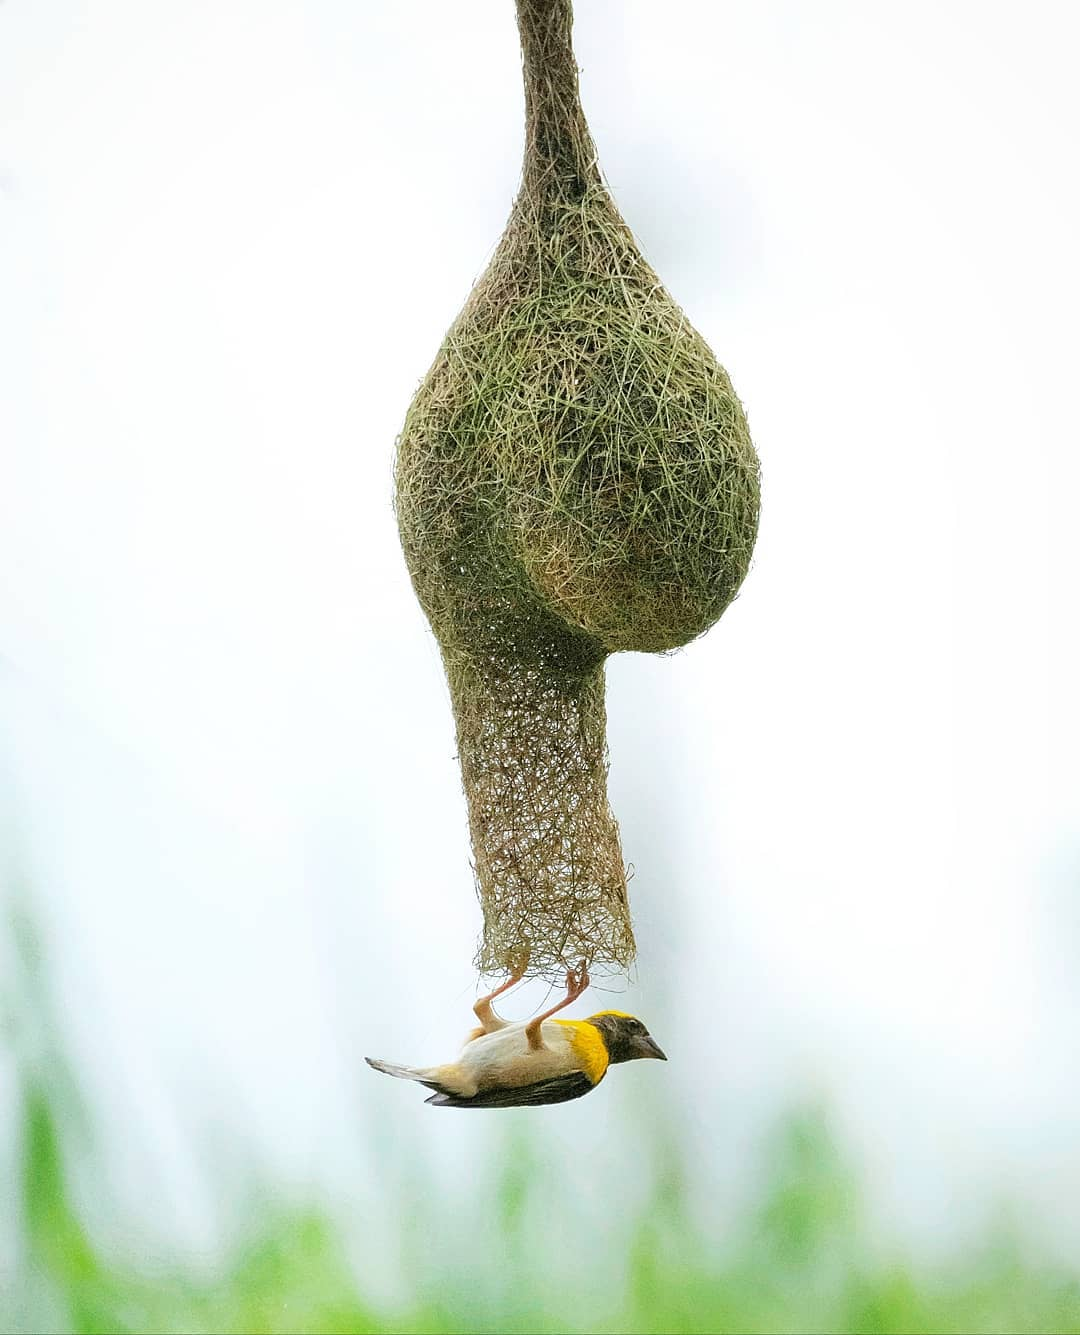 weaverbird nest bird photography by ameya marathe